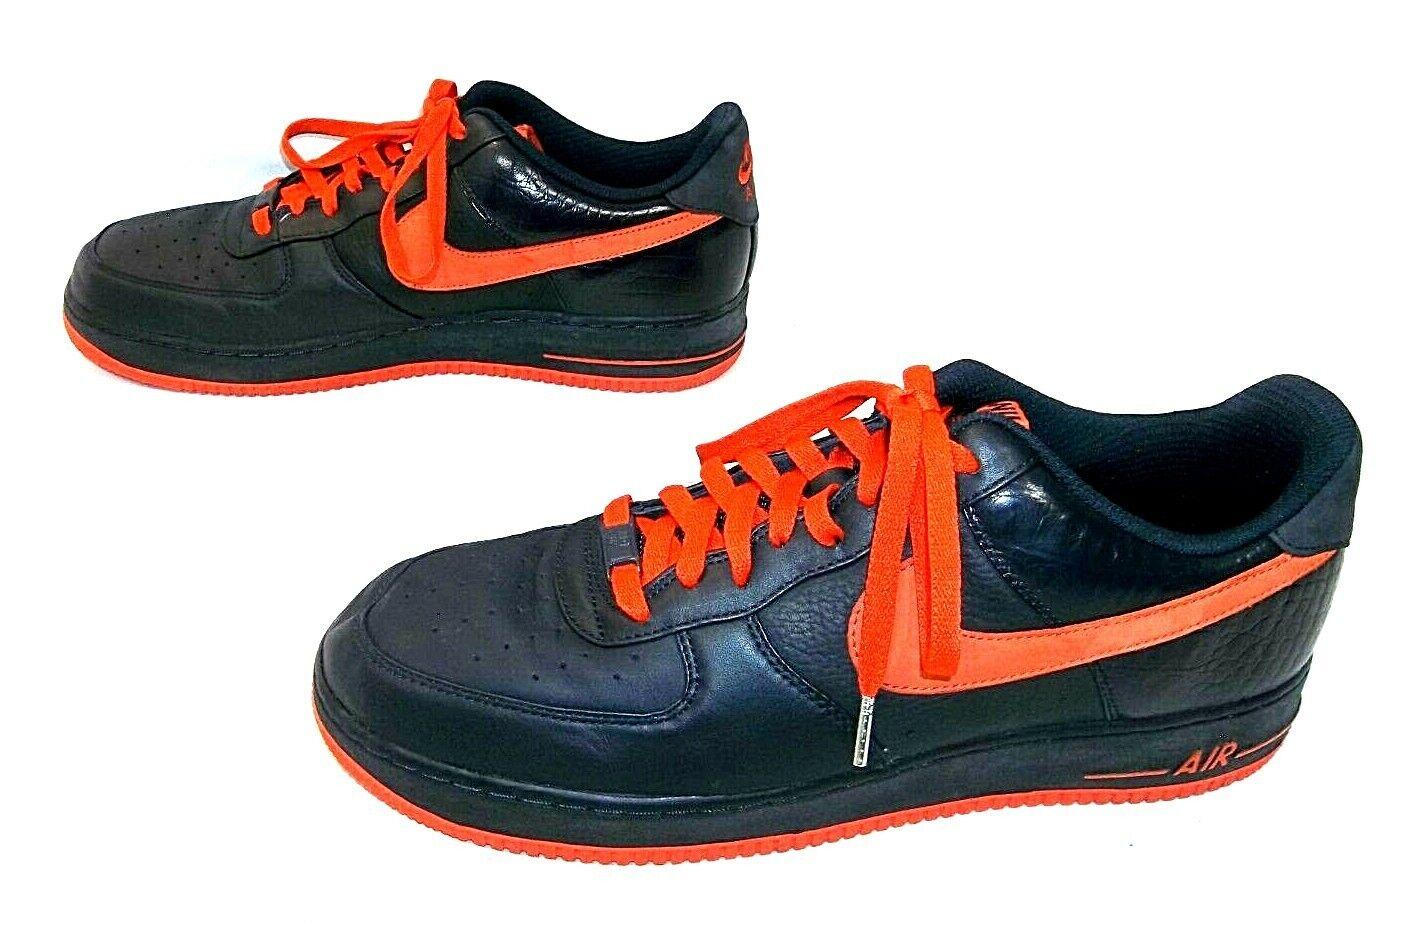 Nike Air Force 1 Low Low Low Premium 13 318775-481 DRK OBSIDIAN TM ORNG-DRK OBSDN CROC ba34e0